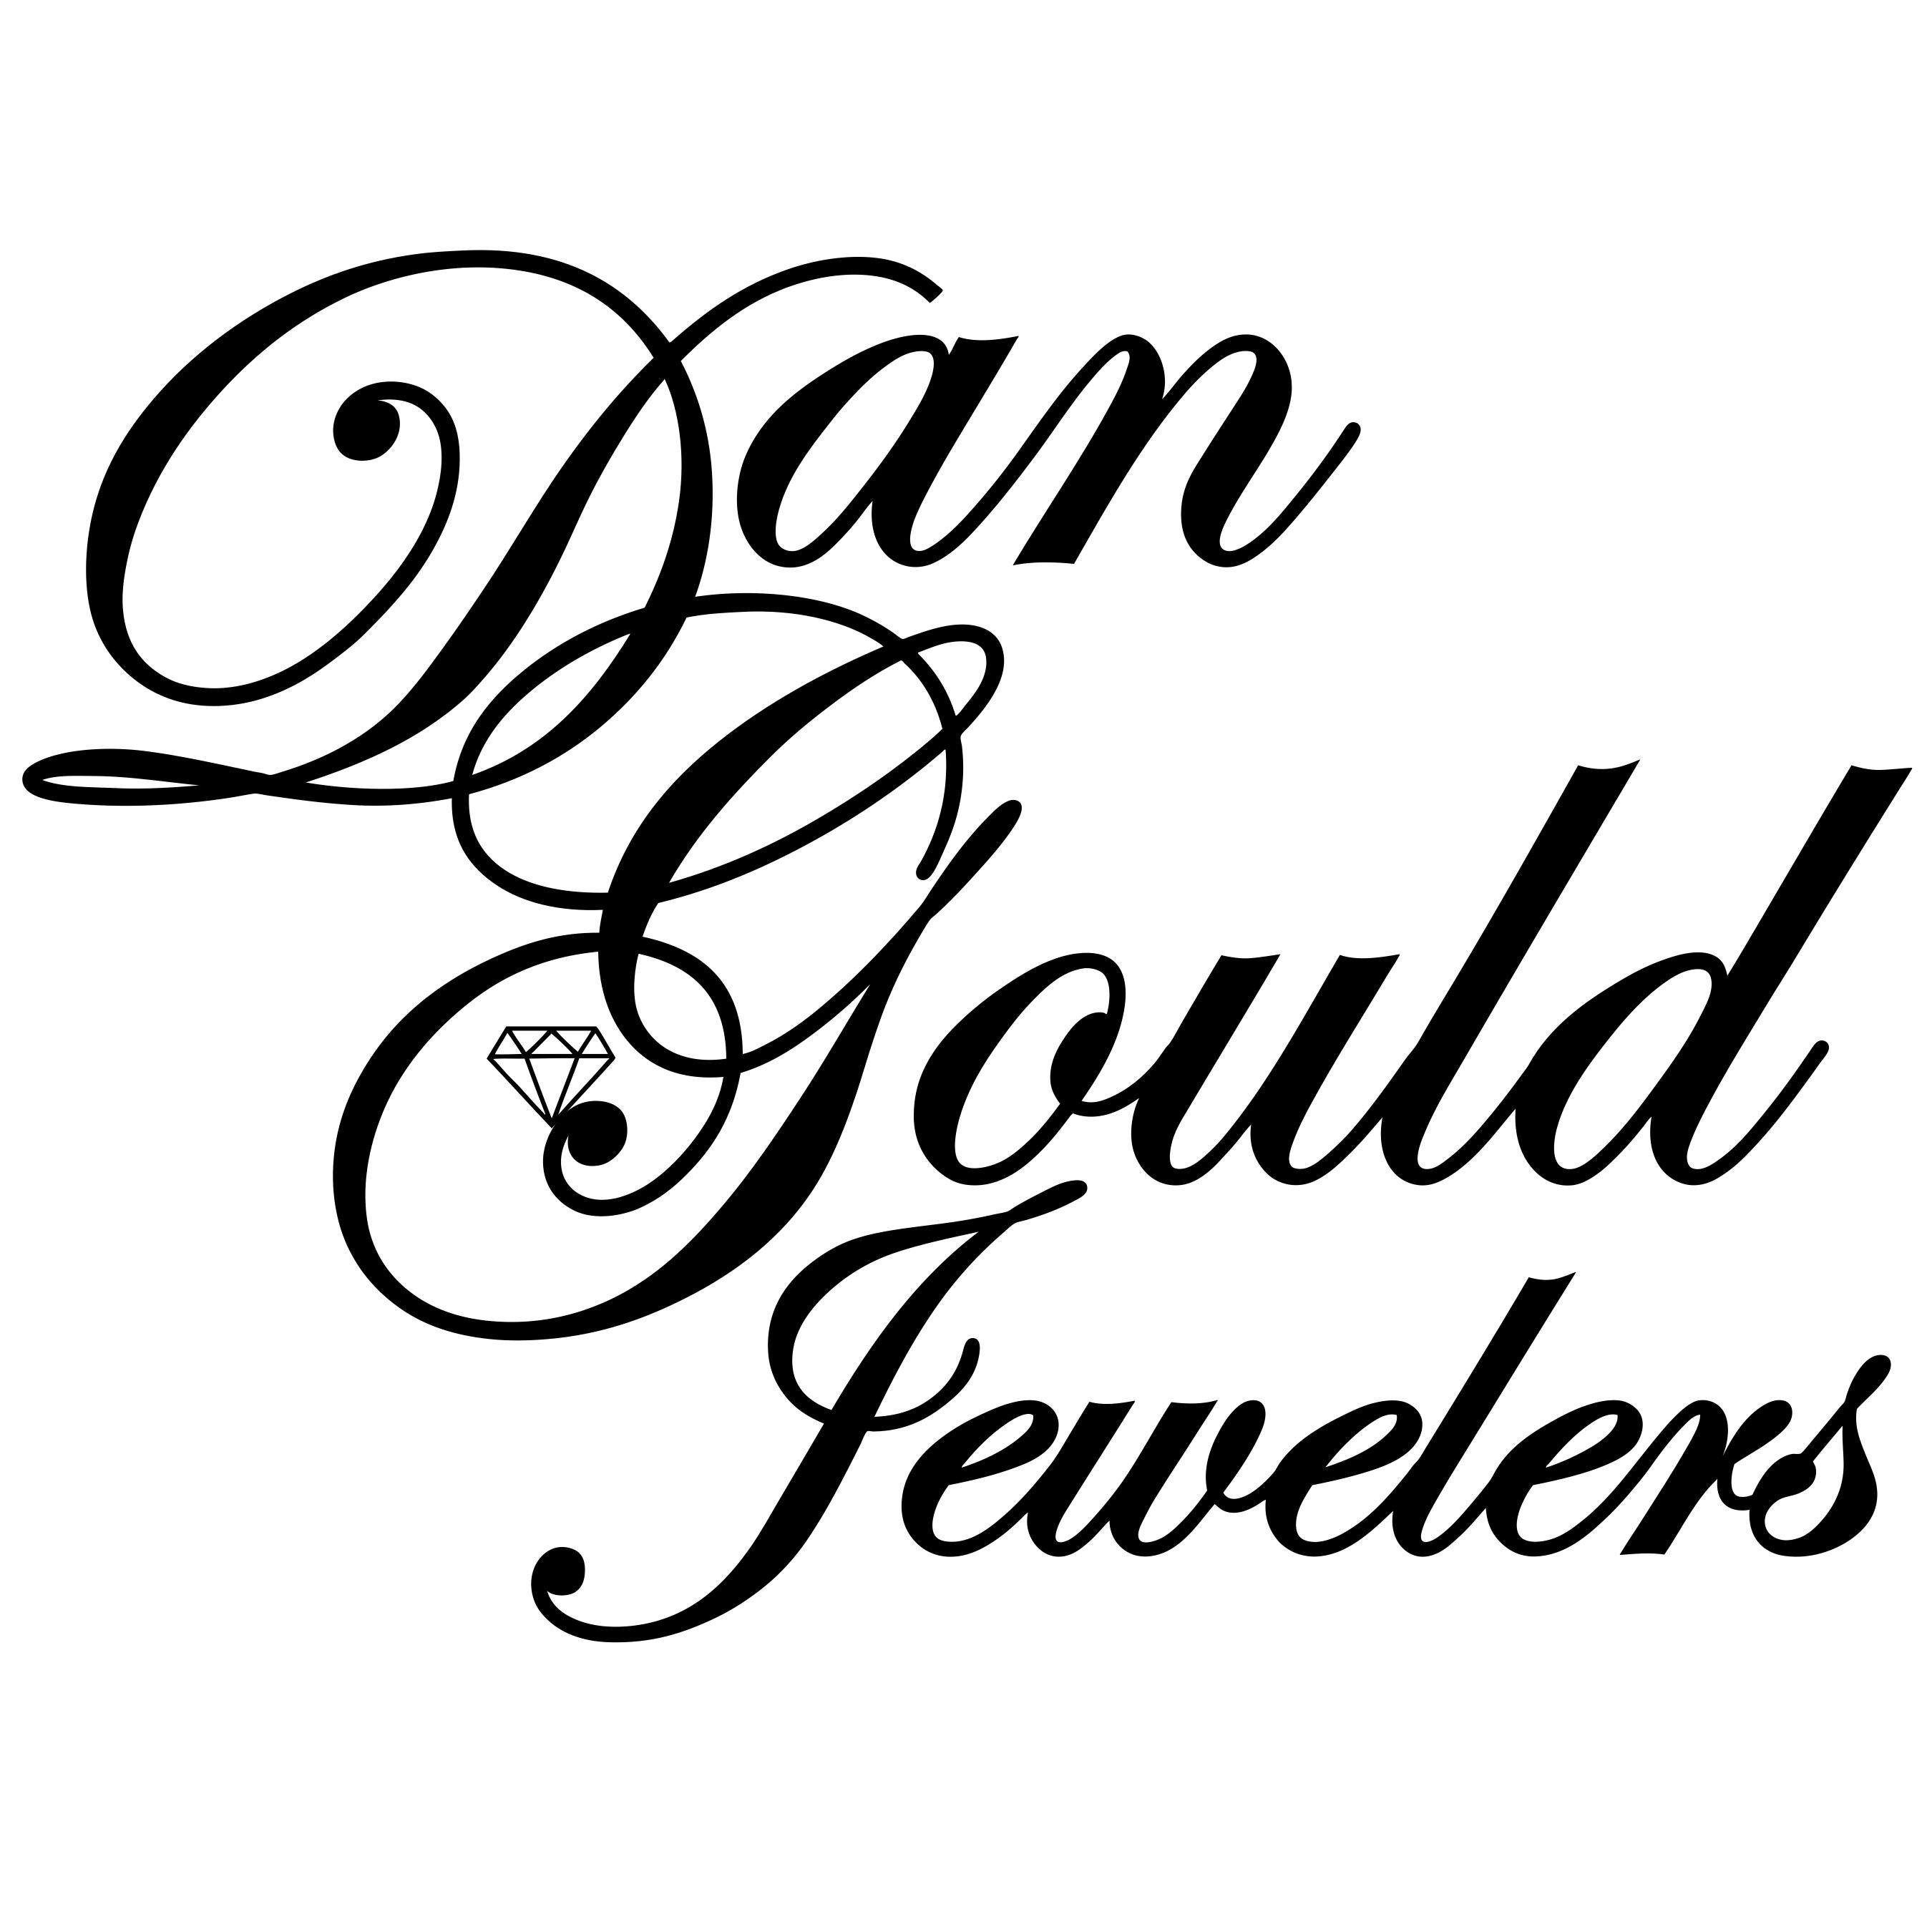 Dan Gould Jewlers